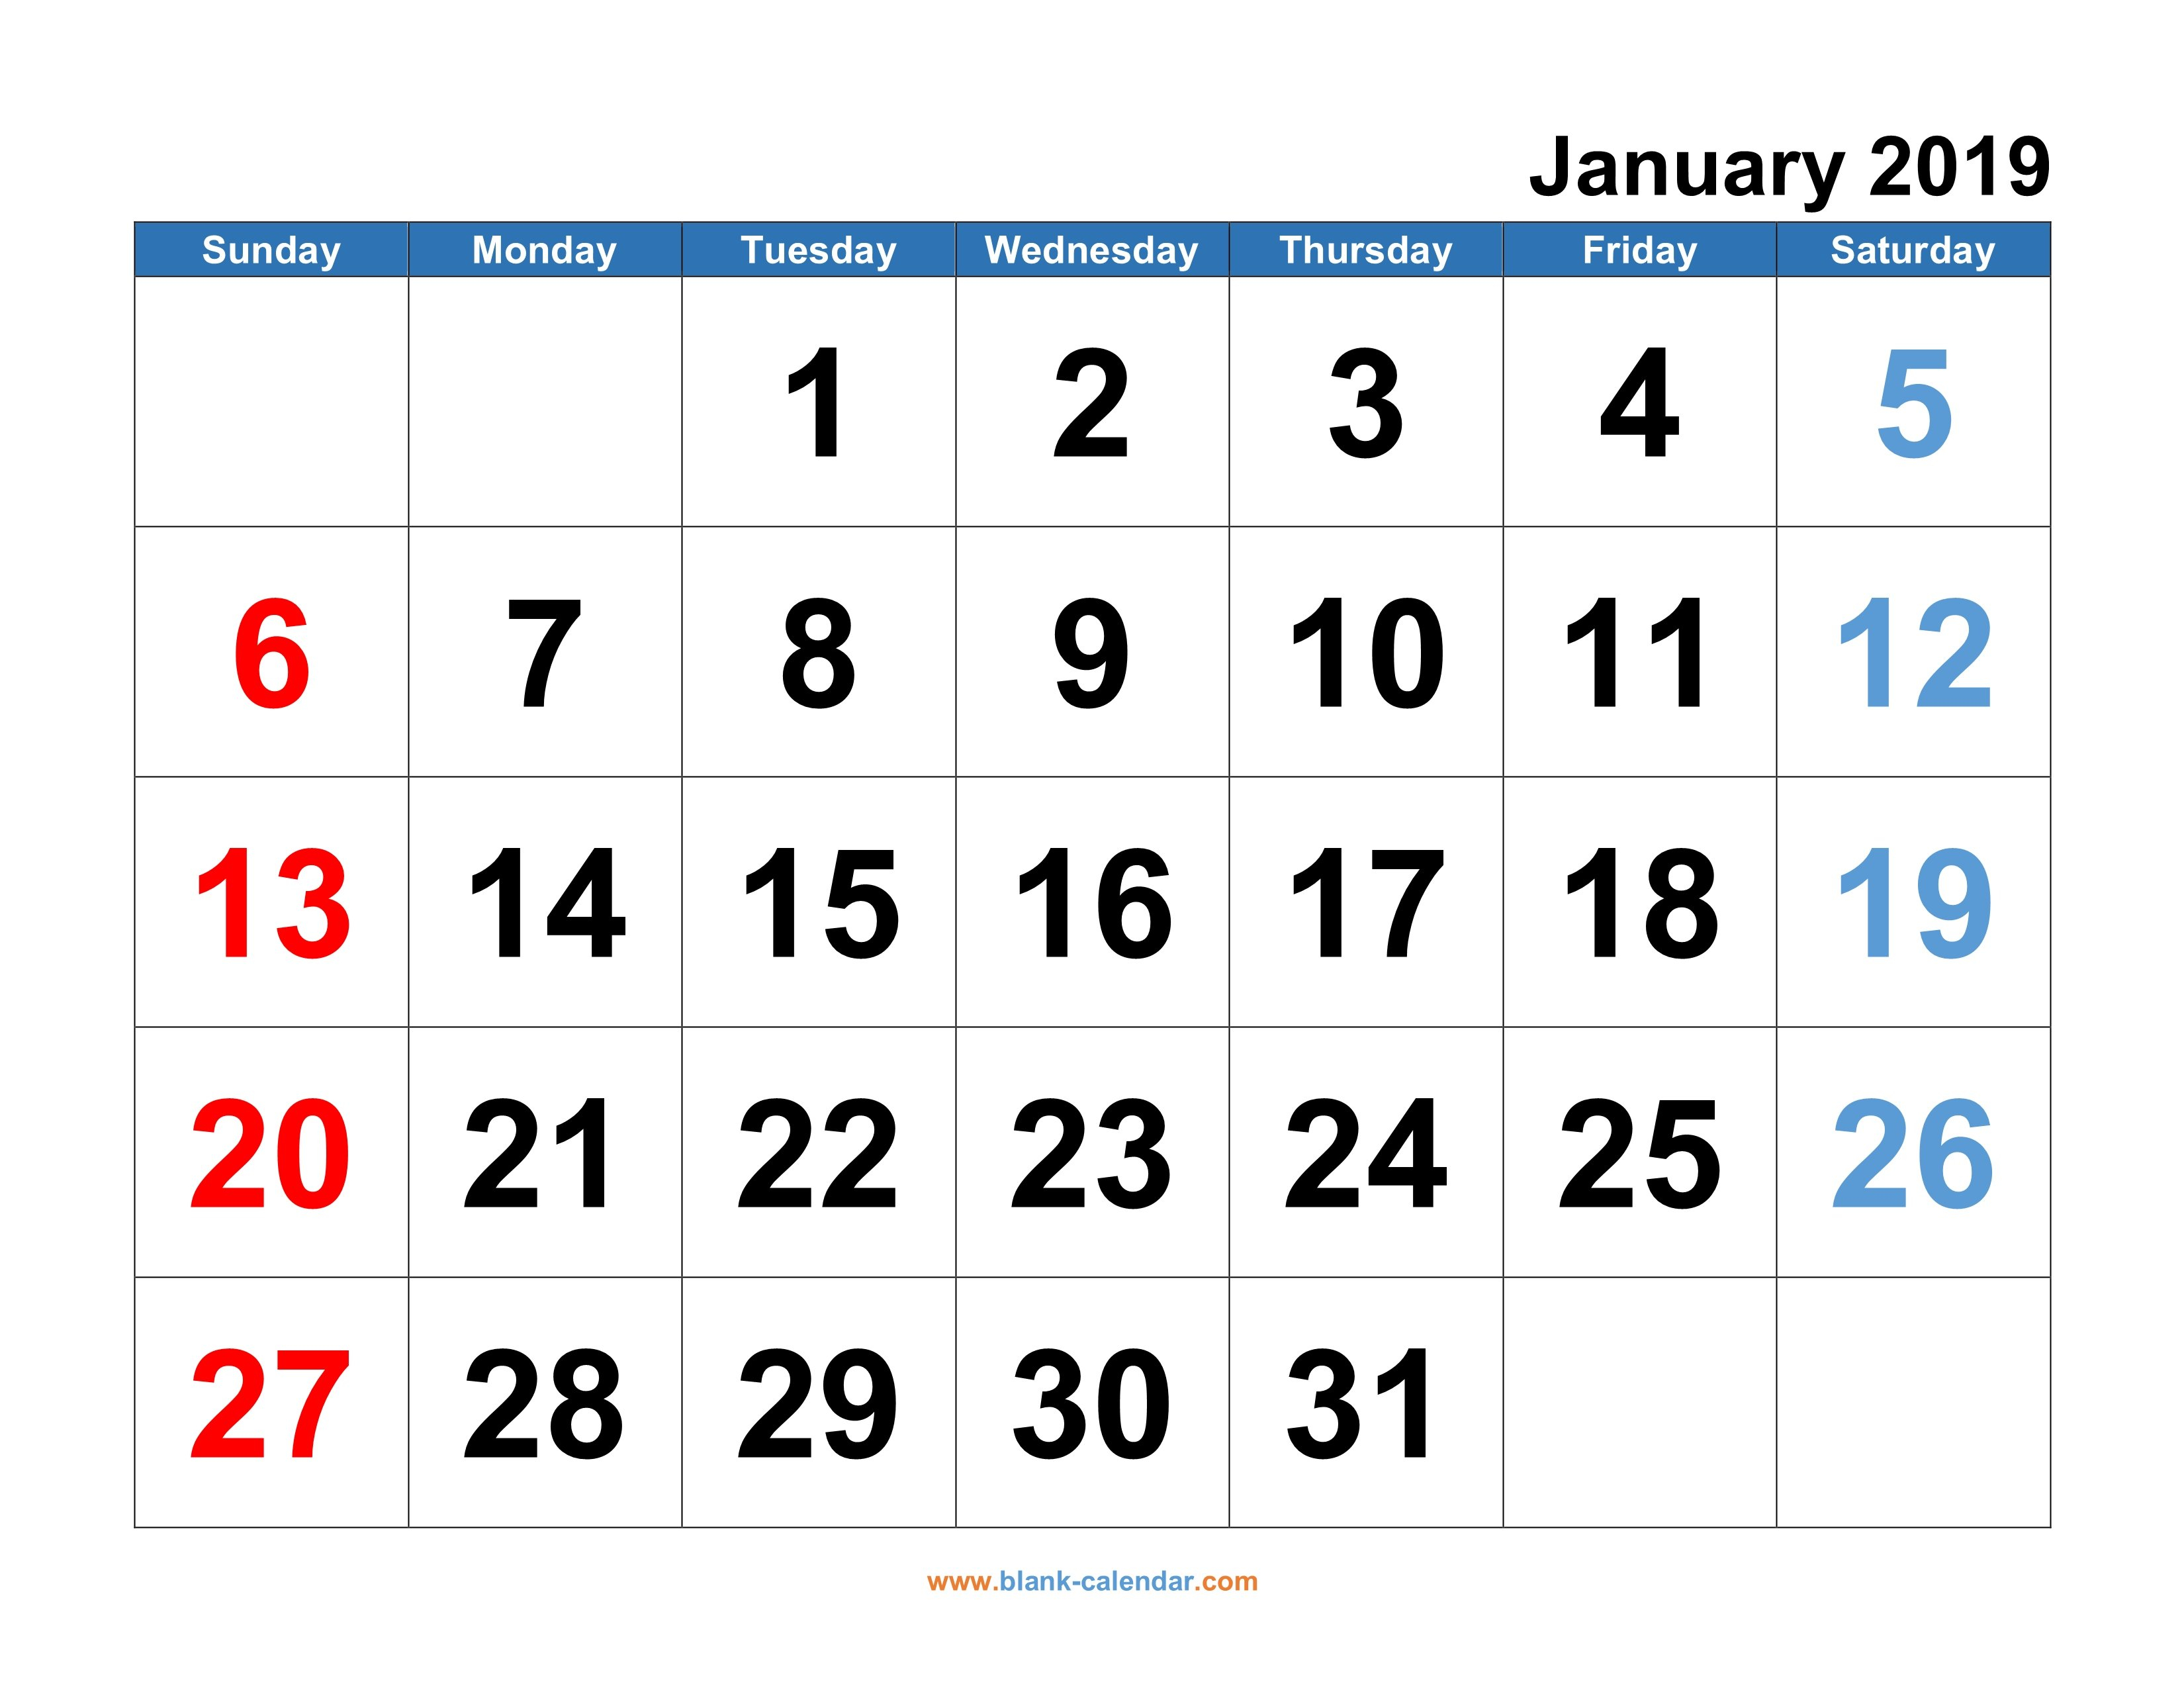 Monthly Calendar 2019   Free Download, Editable And Printable Calendar 2019 Calendar